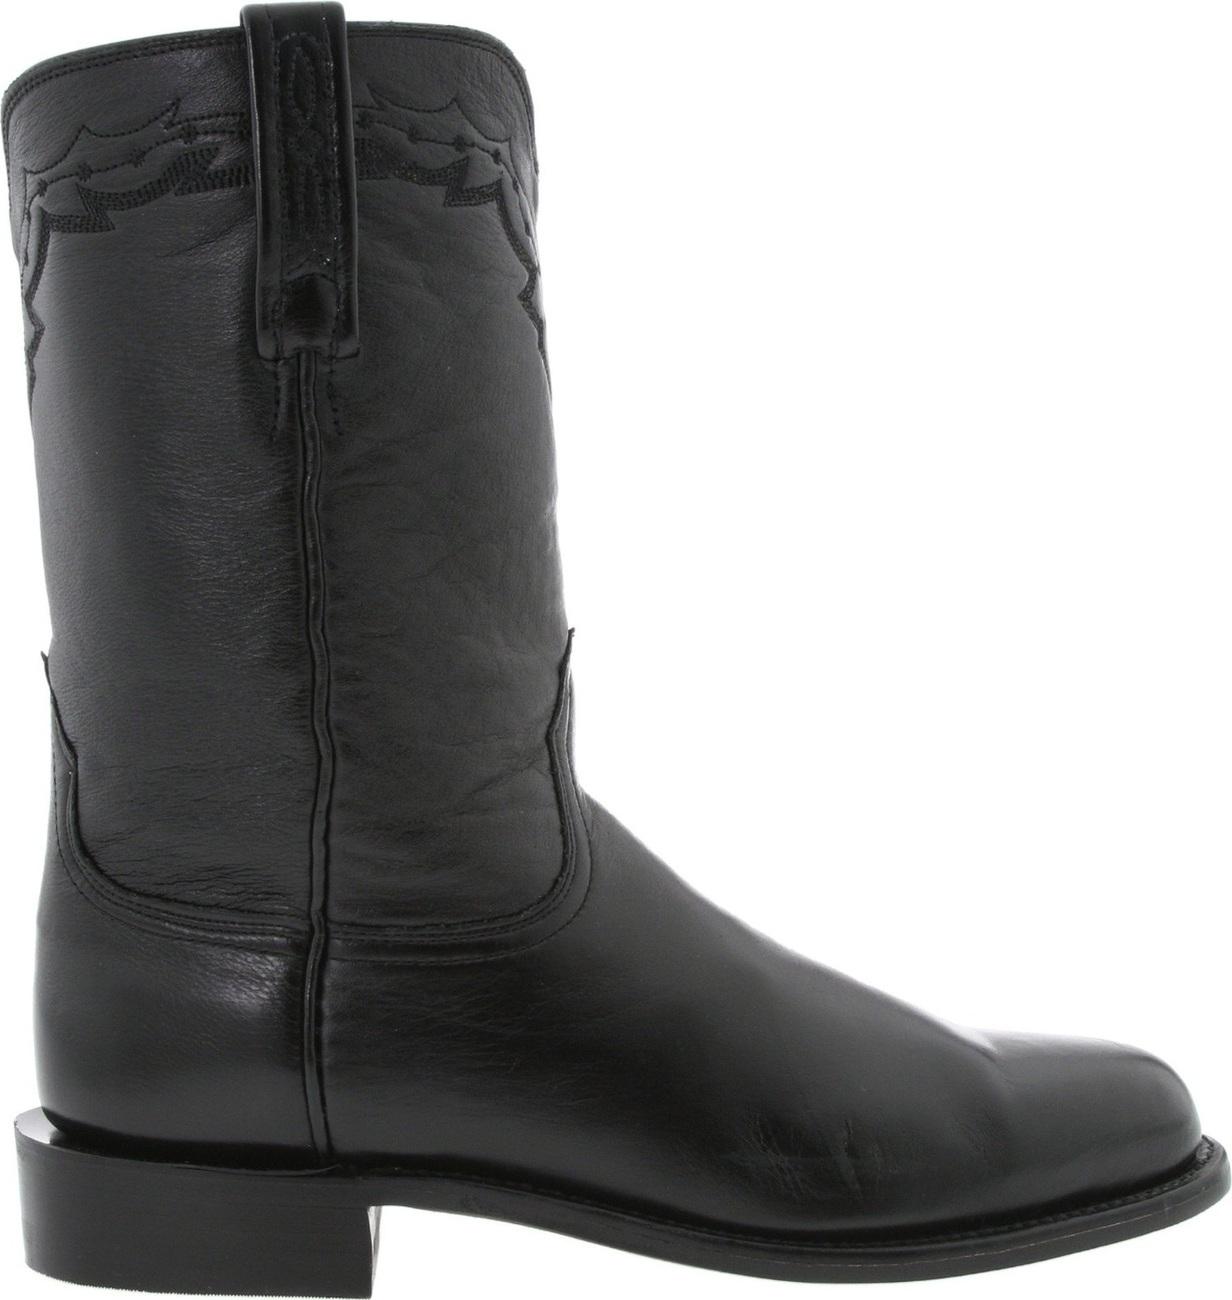 Lucchese Wellington Lonestar Roper Boot - Black - US 11EE - NIB